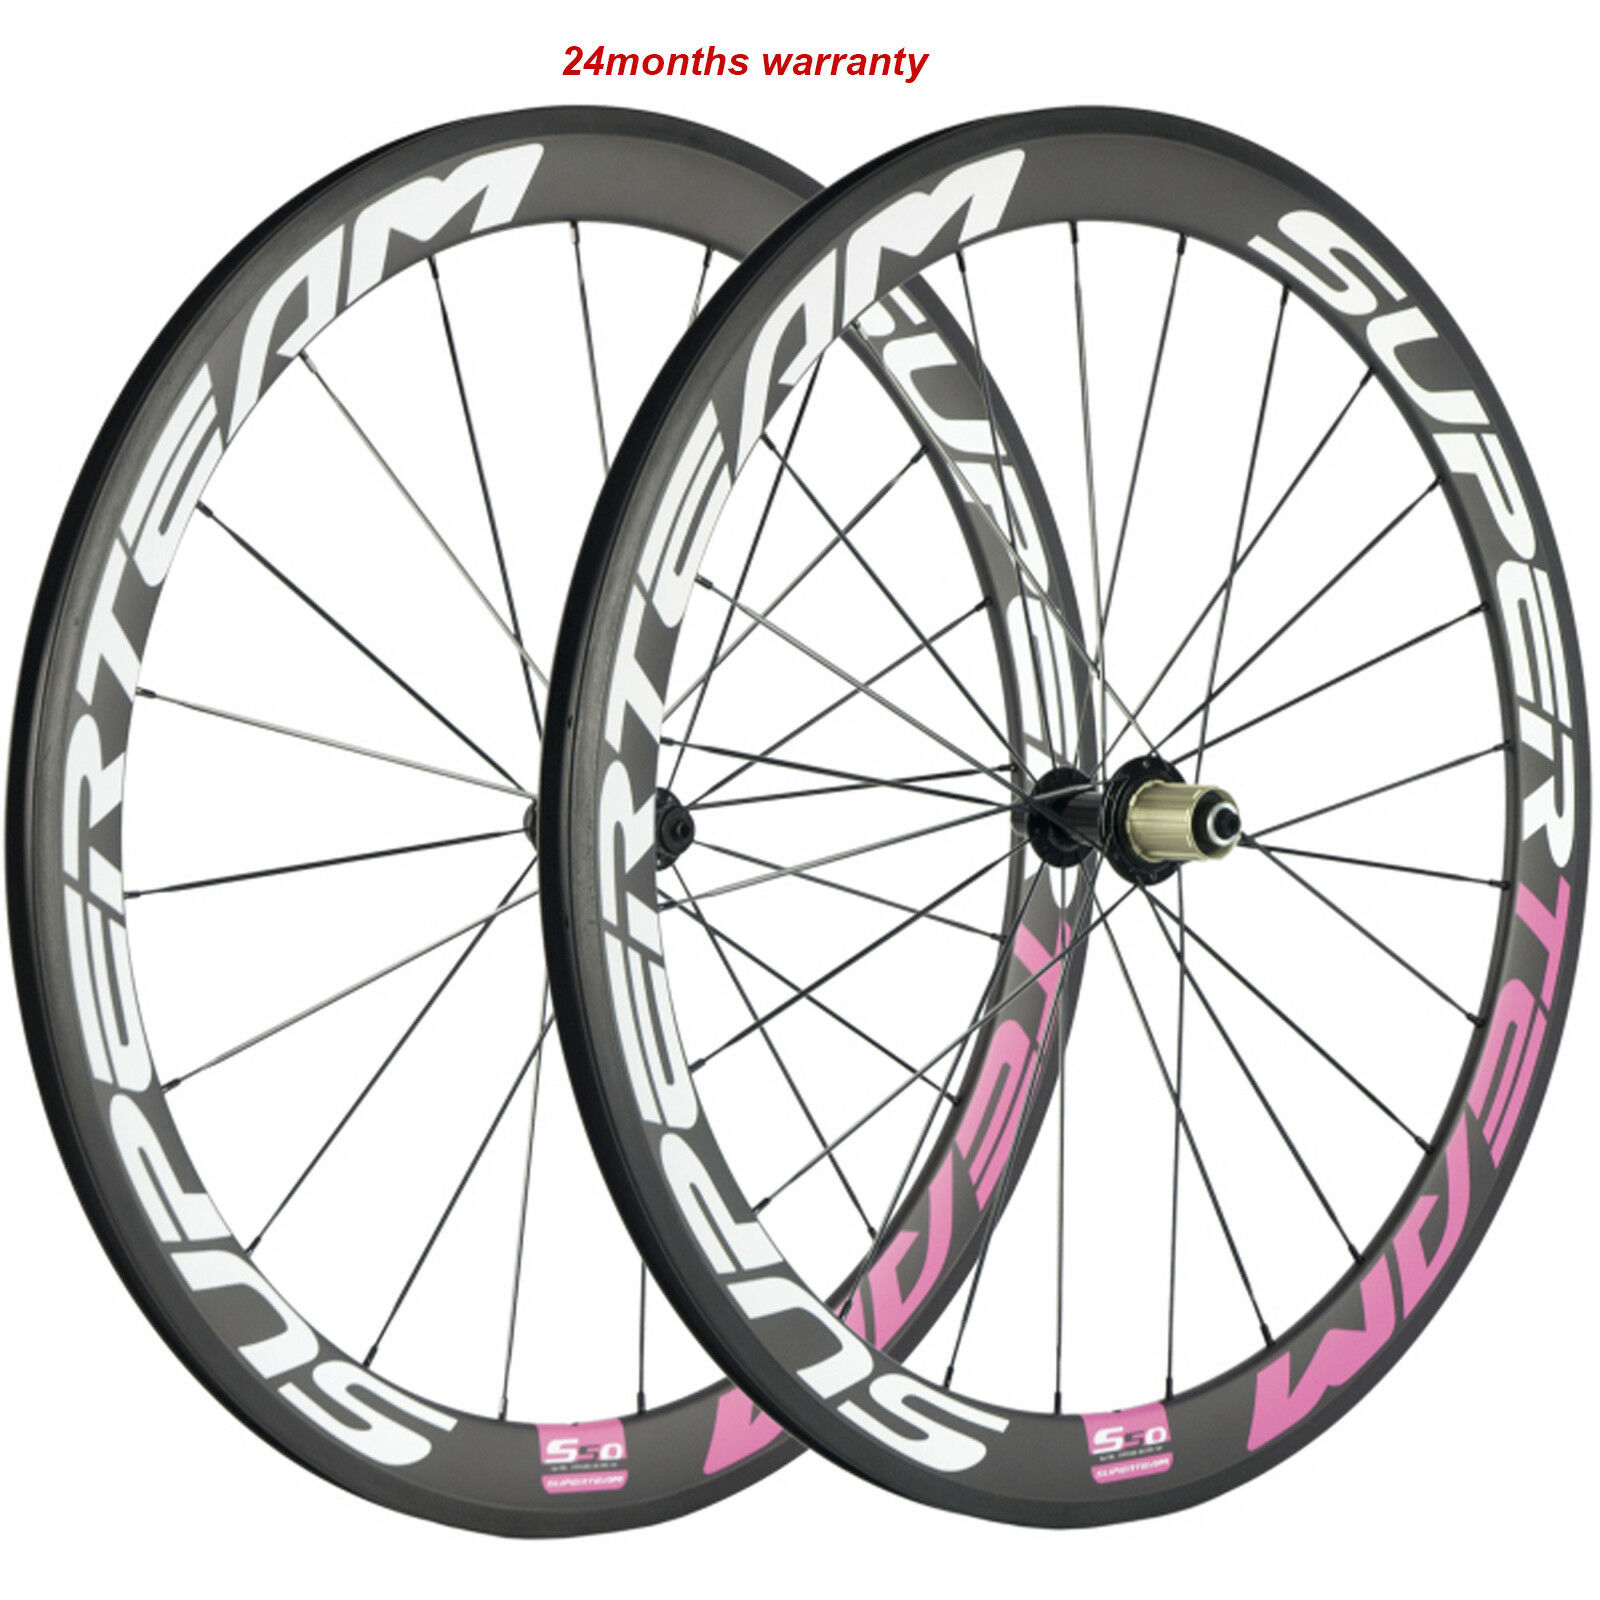 Superteam Carbon Fiber  Road BIke Wheels 700C Clincher Wheelset 50mm matte Wheels  shop clearance